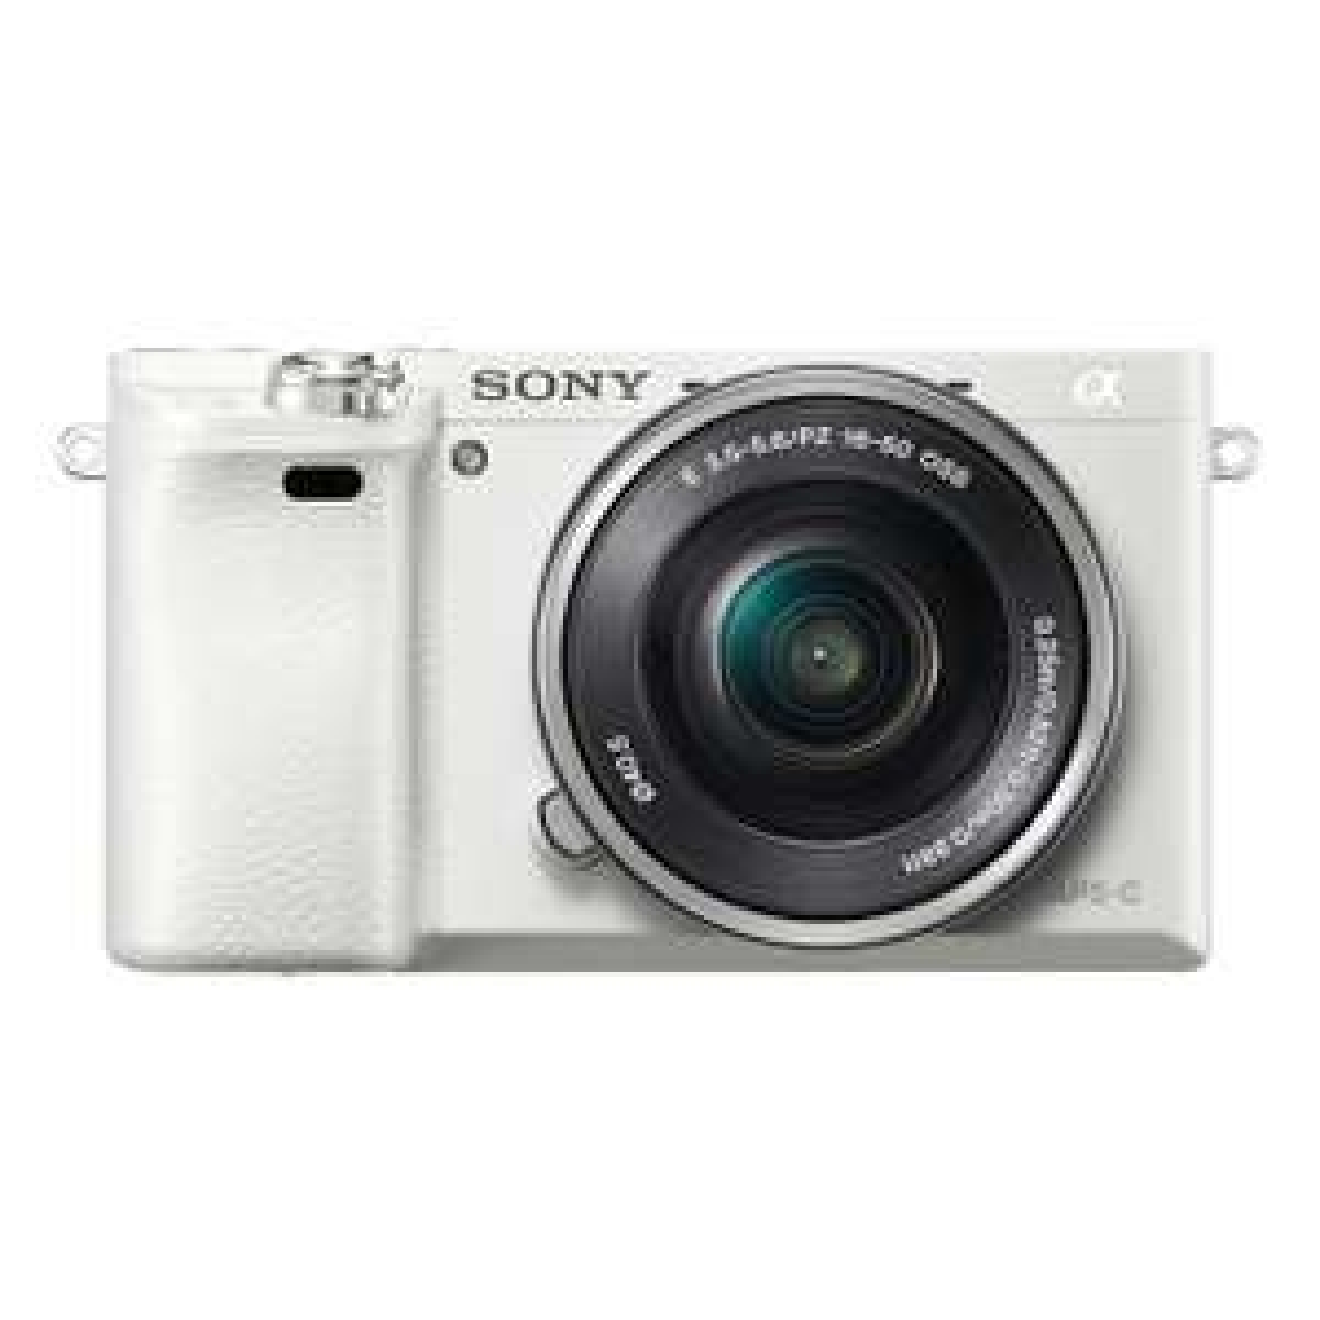 Sony Alpha 6000 Systemkamera [24,3 MP APS-C, inkl. SEL-P1650 Objektiv, weiß] für 531,56€ @ Amazon.fr